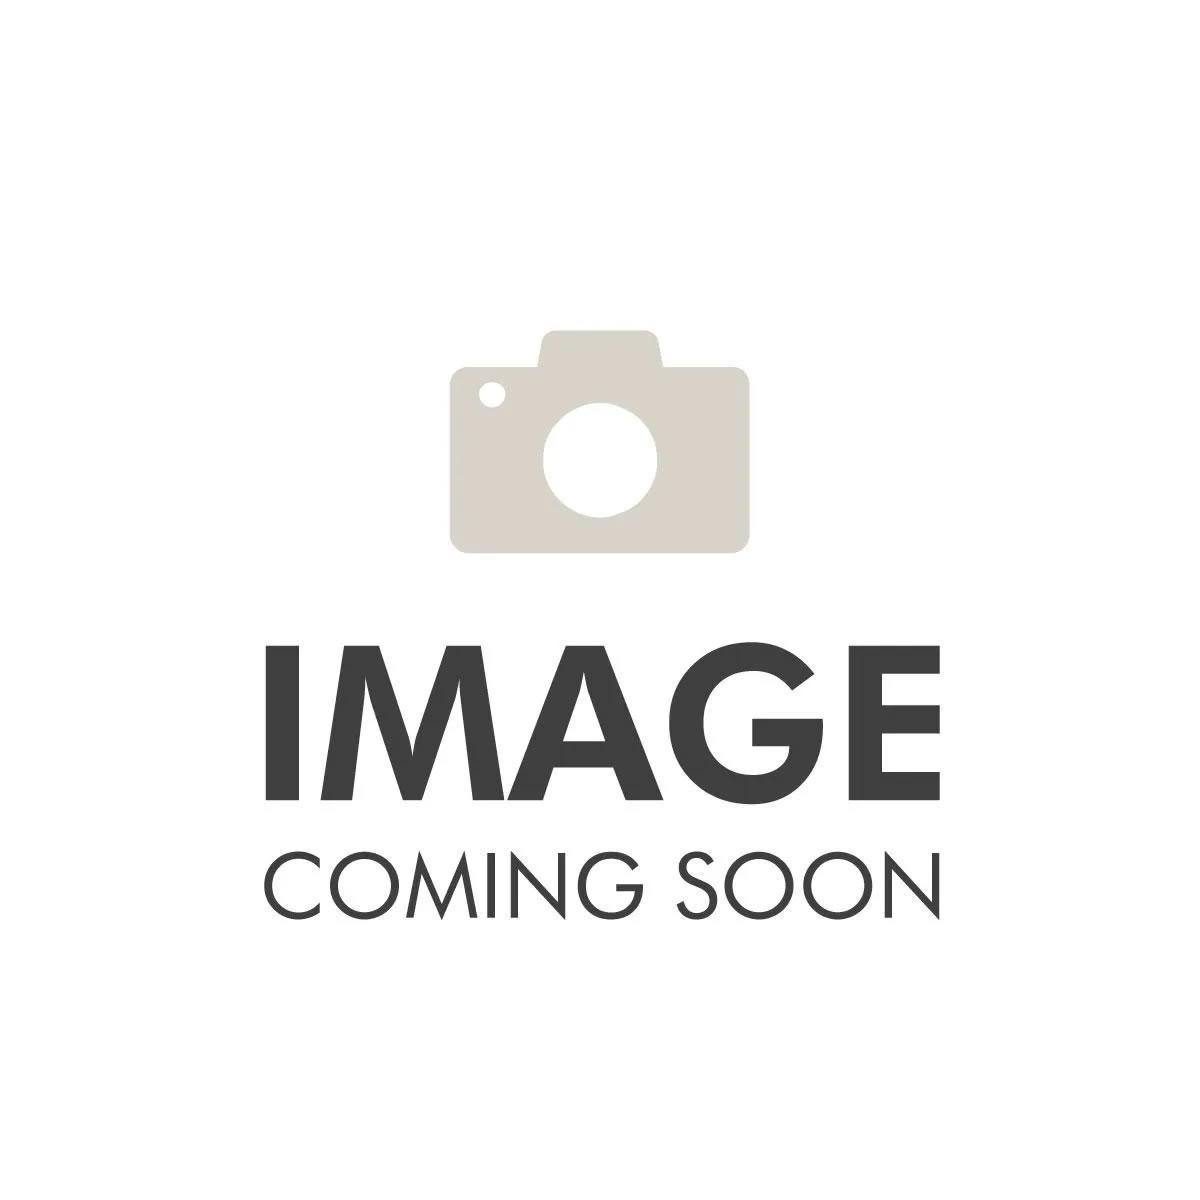 Tail Light Covers Chrome 07-12 Jeep JK Wrangler